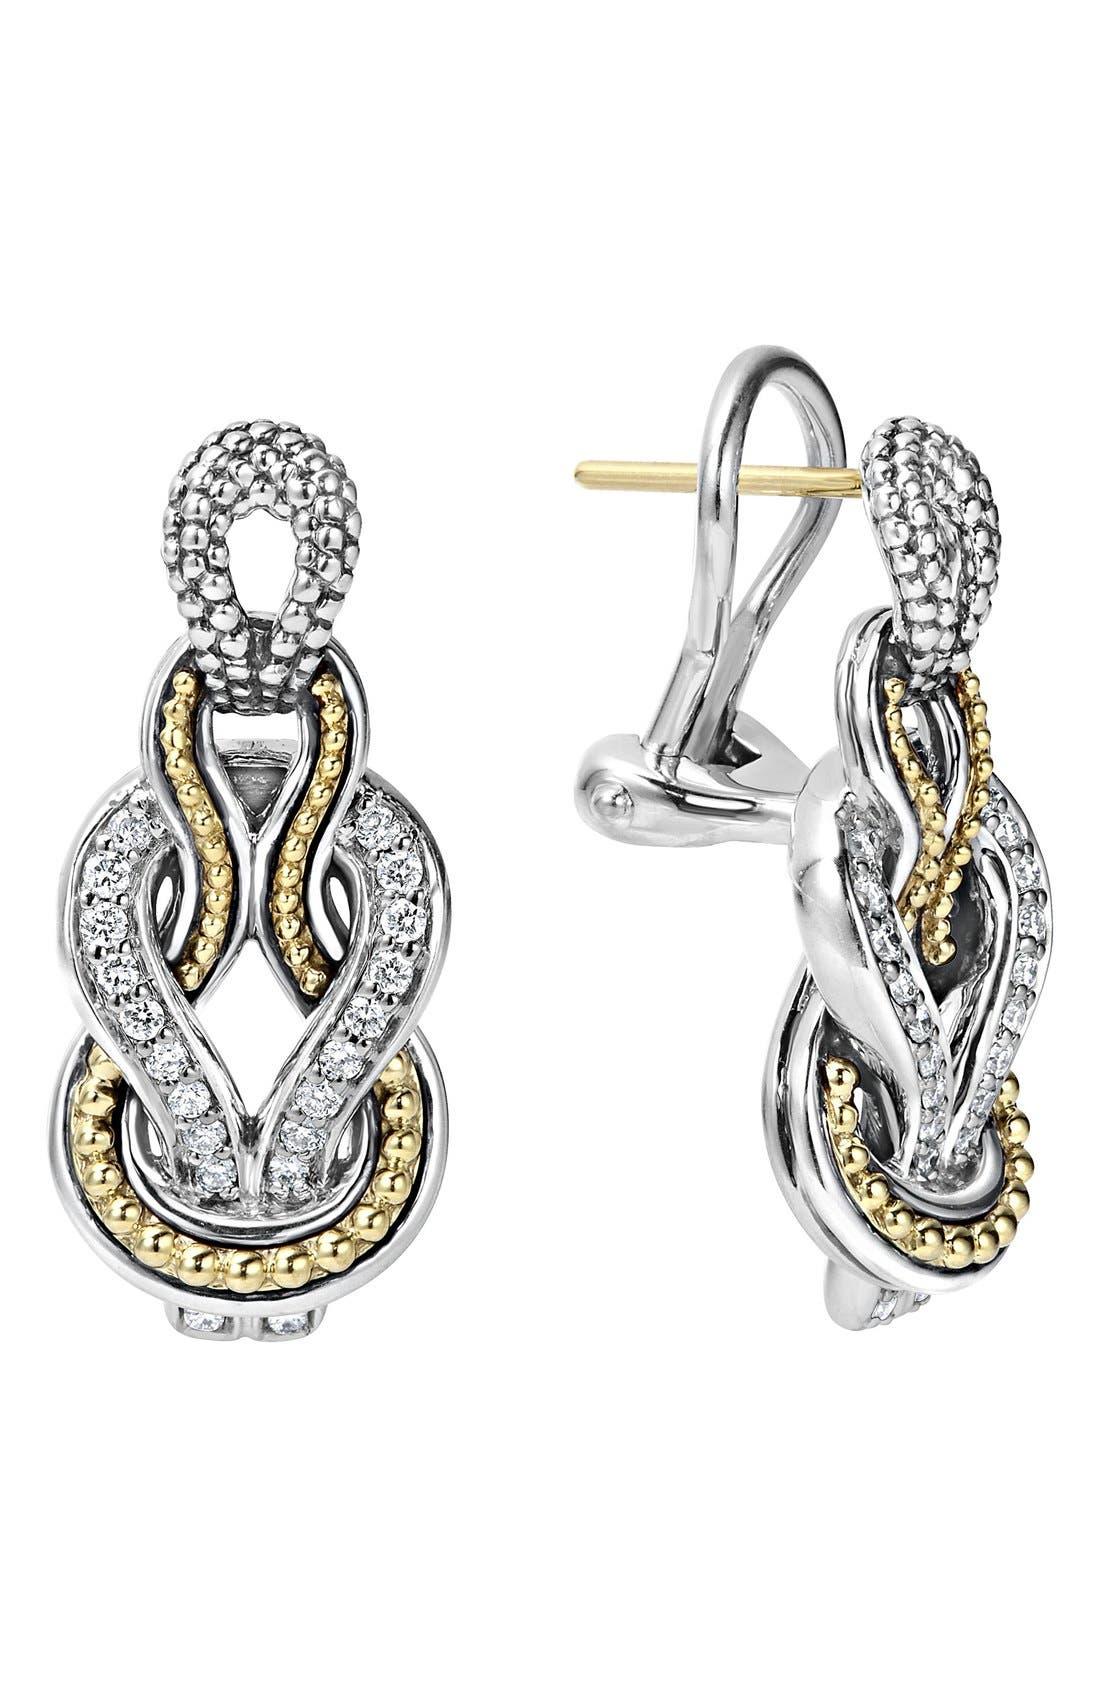 LAGOS Newport Diamond Knot Earrings